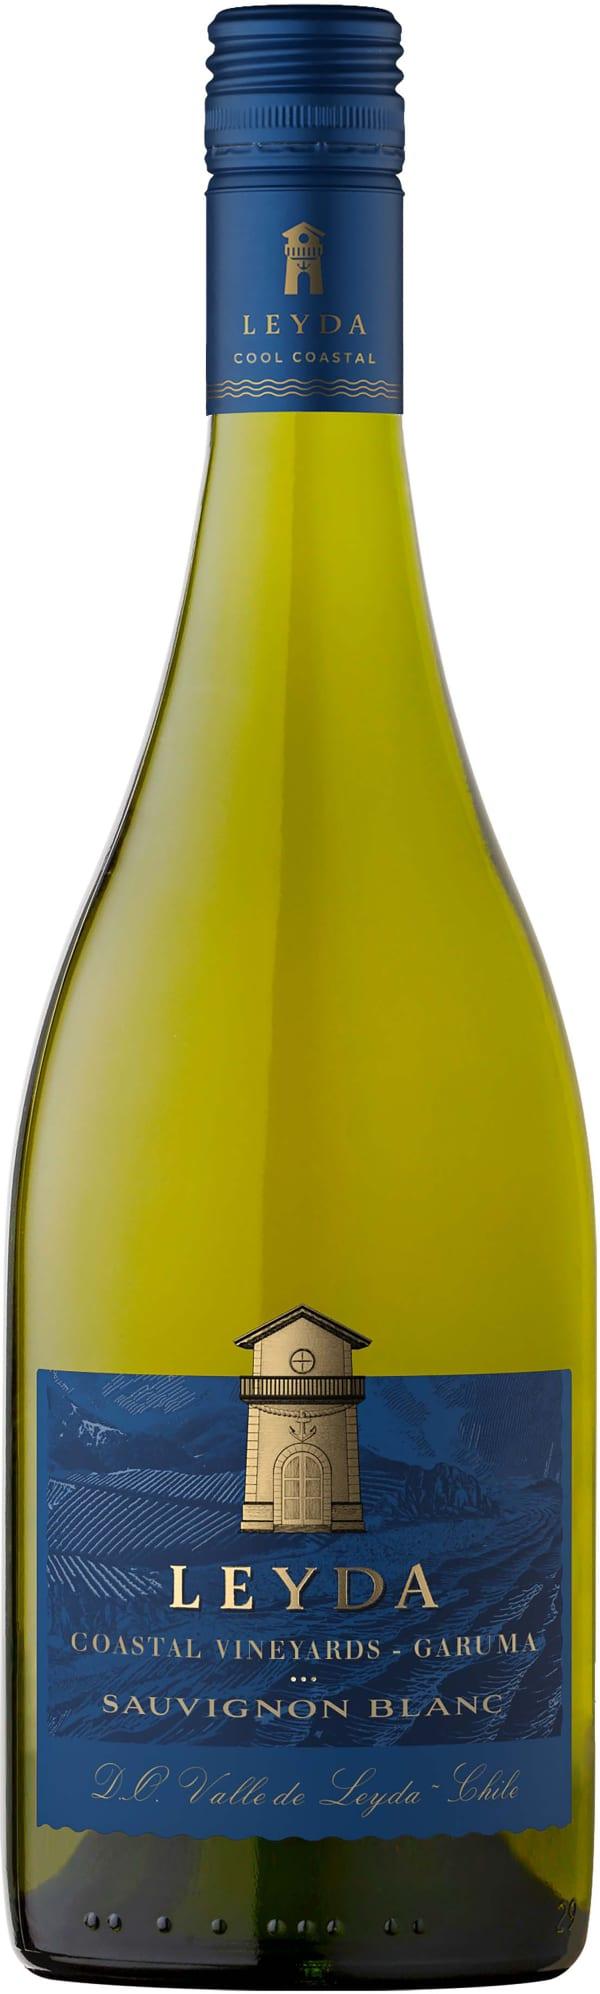 Leyda Garuma Vineyard Sauvignon Blanc 2016